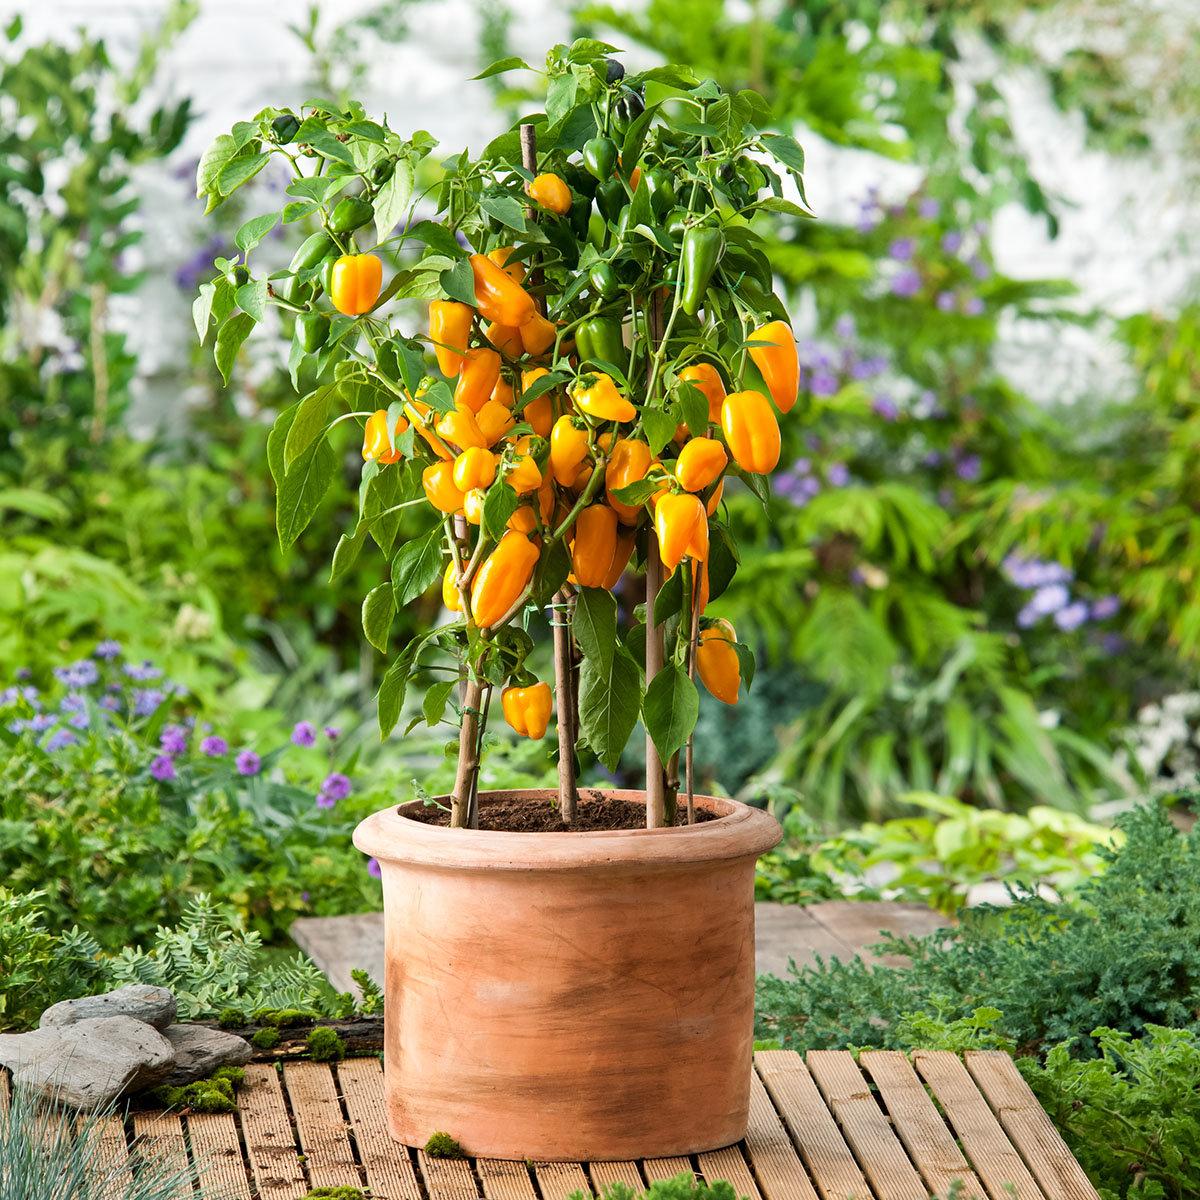 Paprikapflanze Snackpaprika Lubega Mini Yellow, veredelt, im ca. 11 cm-Topf